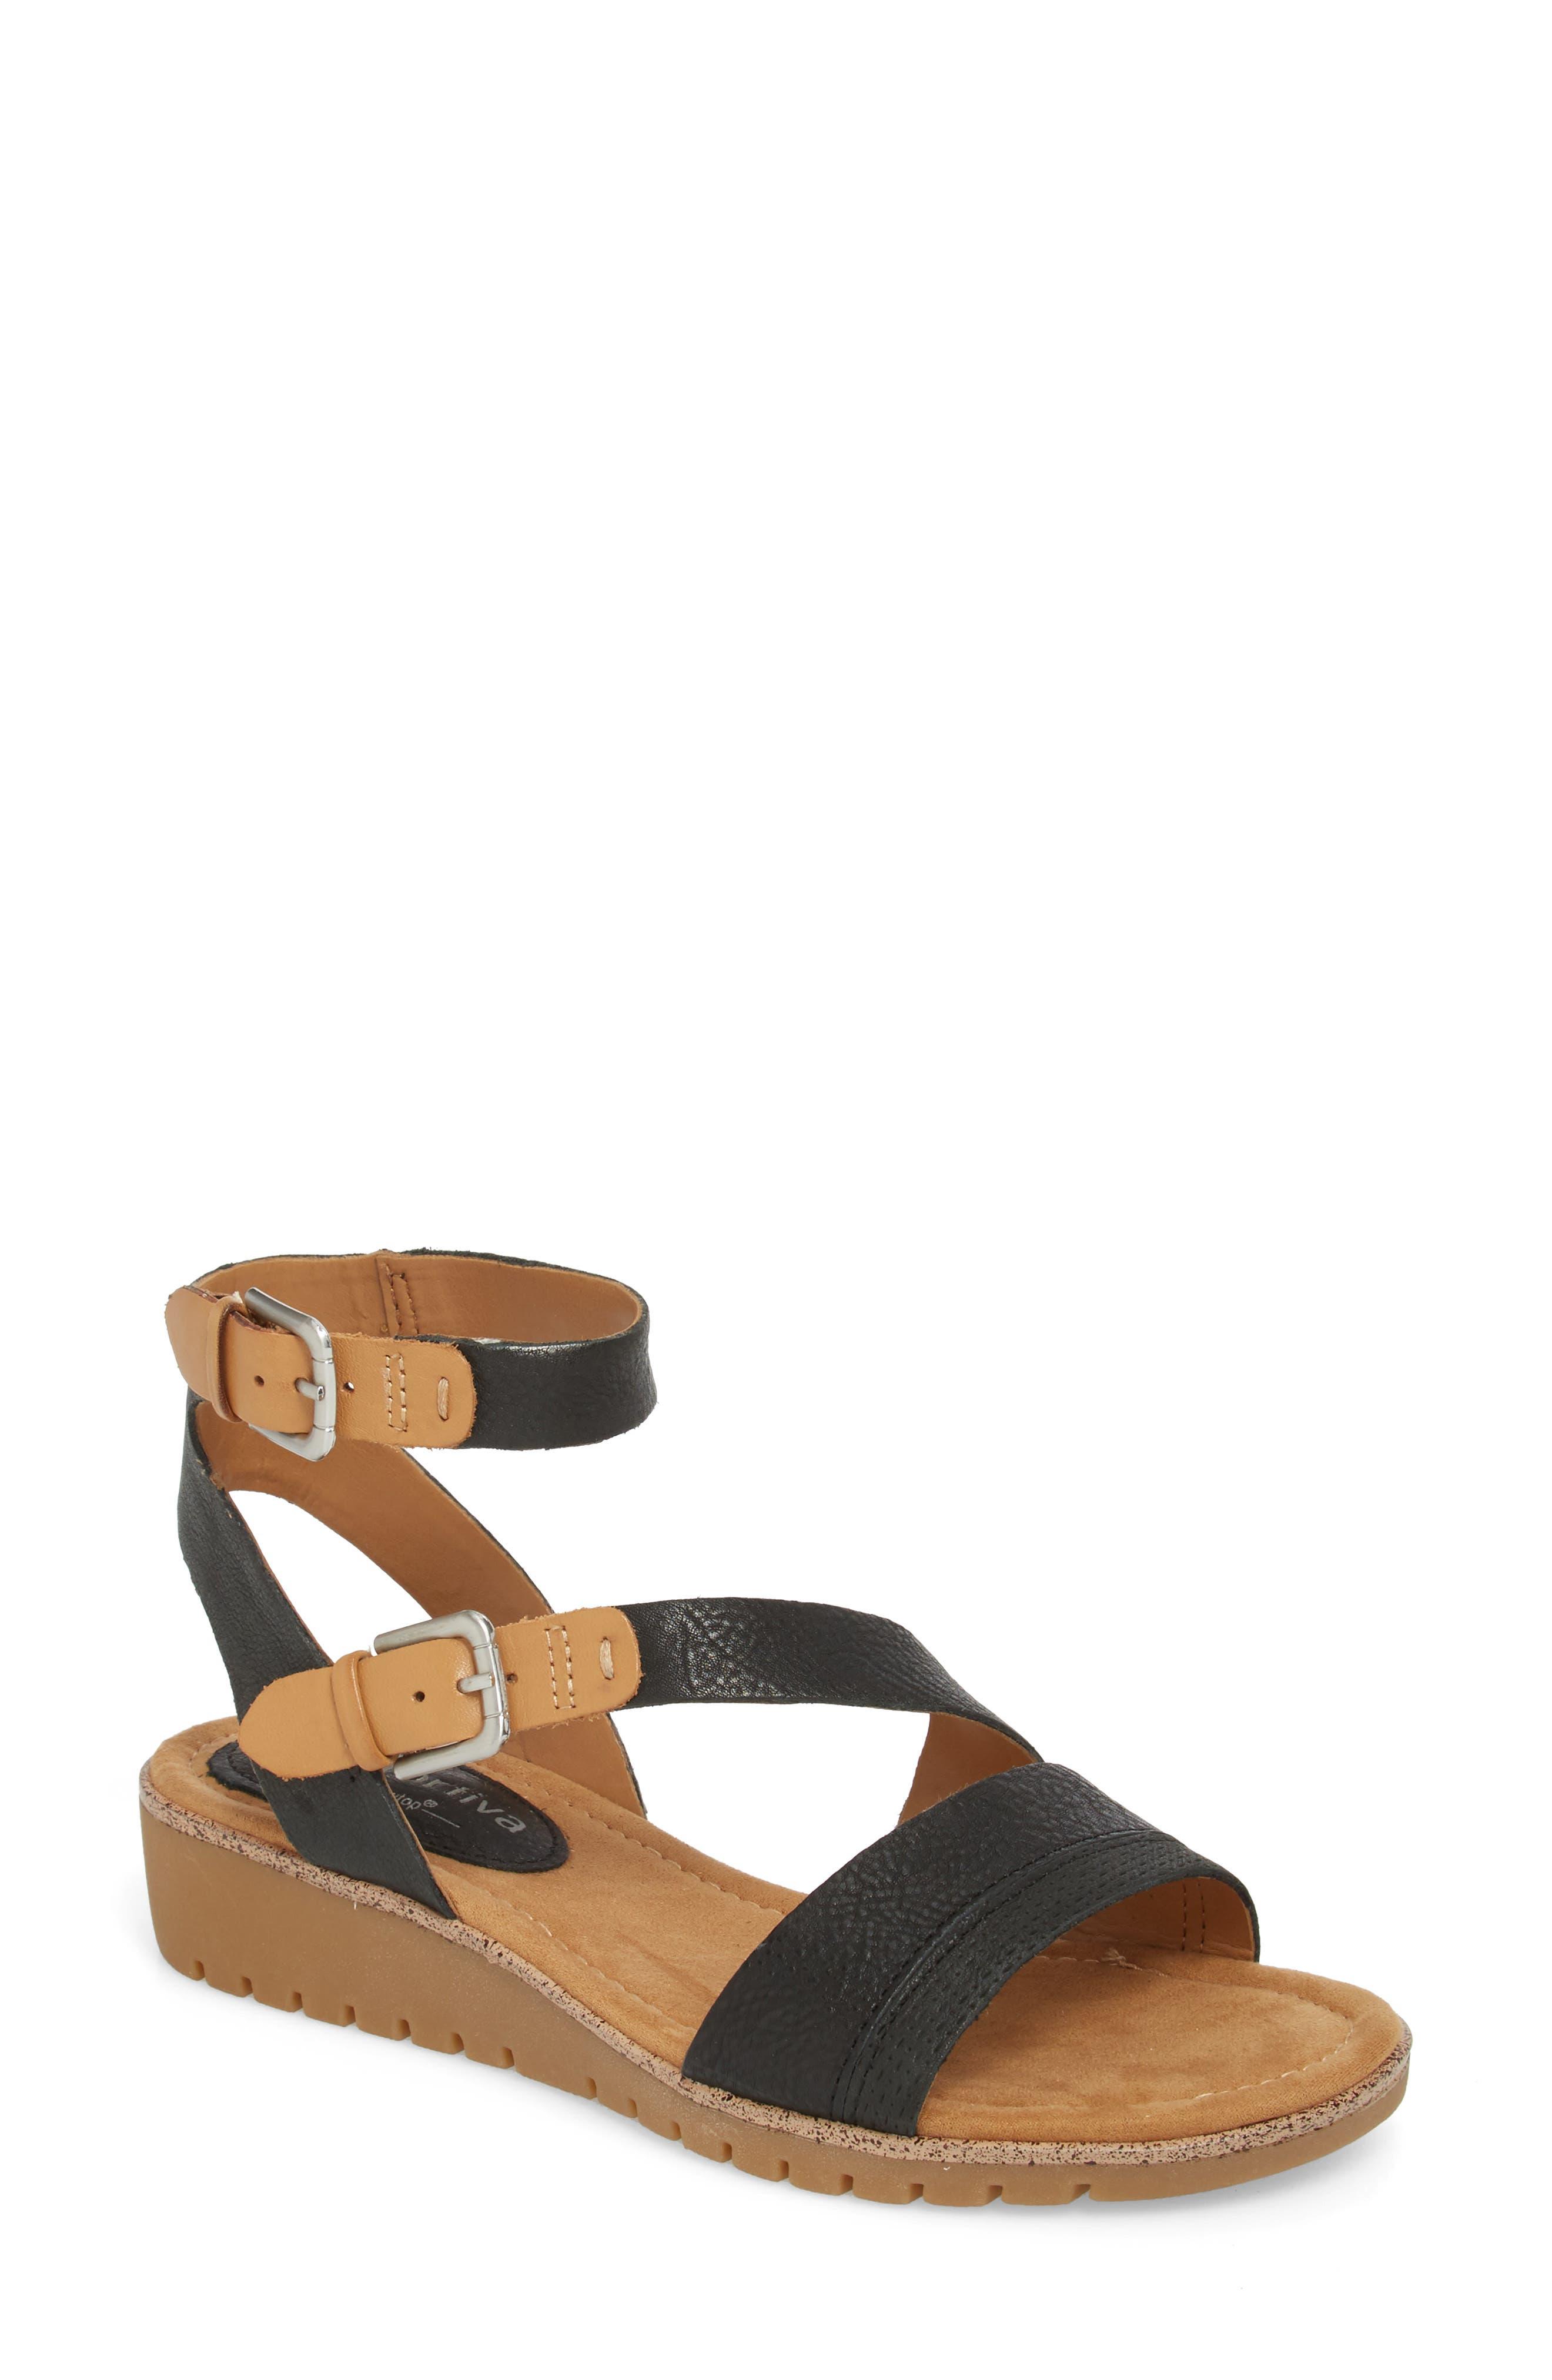 Corvina Sandal,                         Main,                         color, Black/ Sand Leather